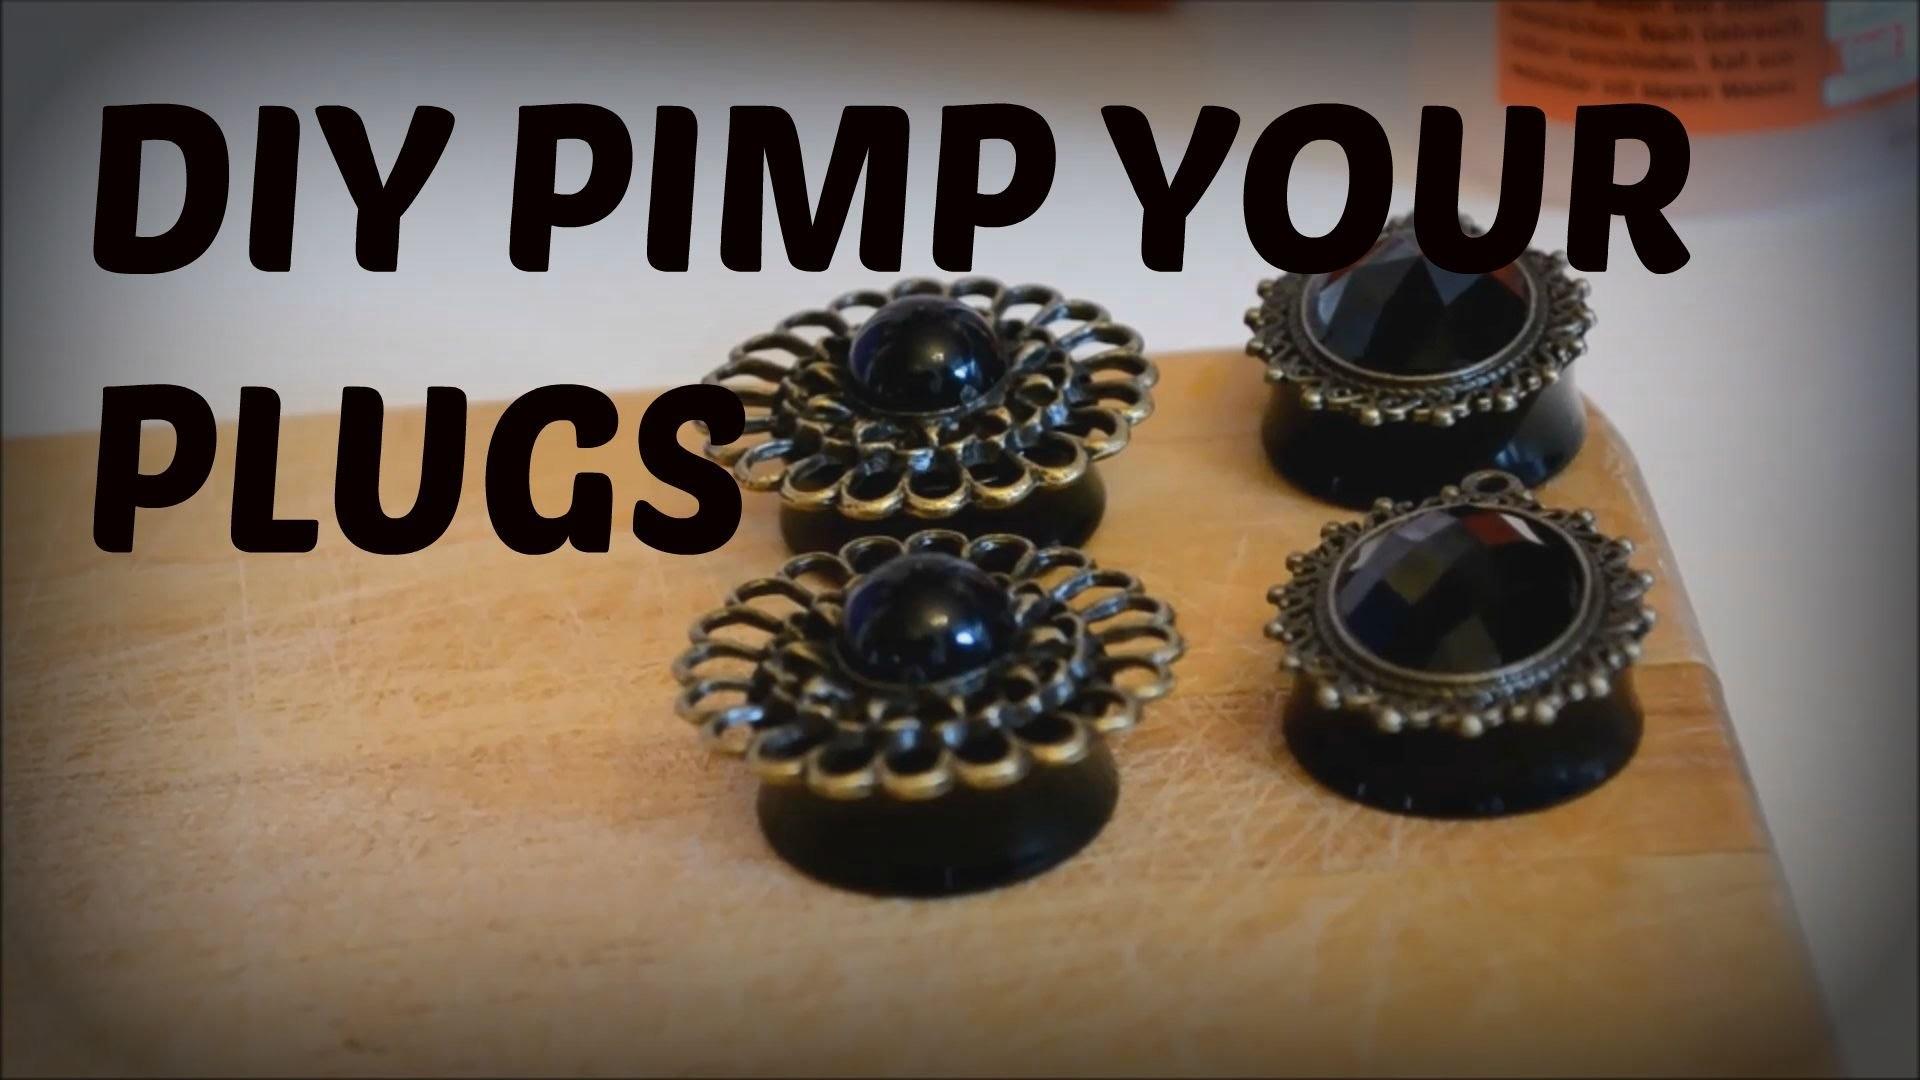 DIY PIMP YOUR PLUGS | Laura He